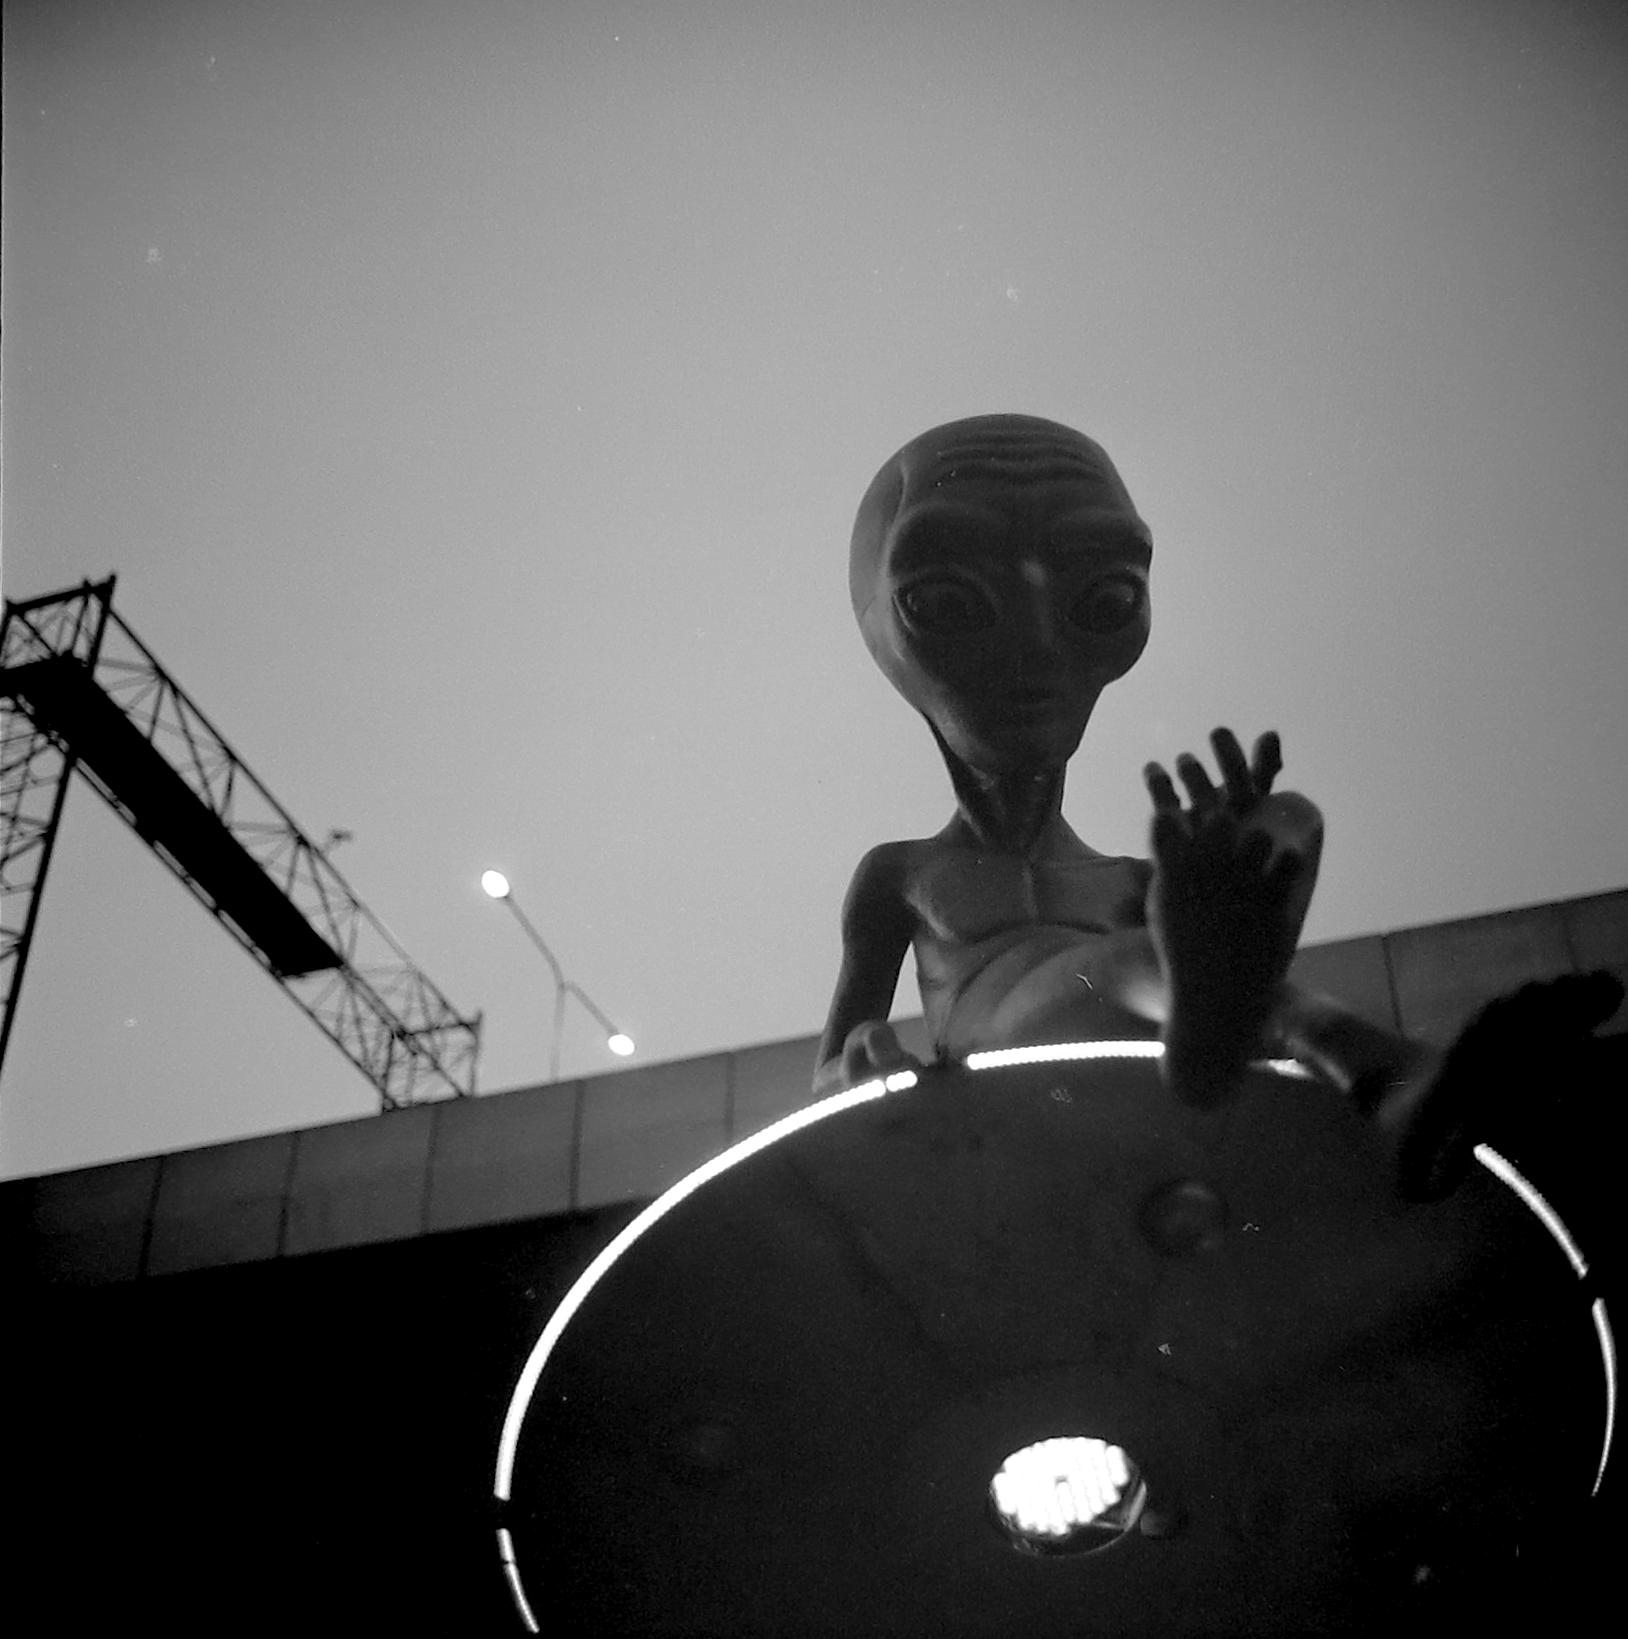 Chromacomaphoto Bangkok Street Photography Delta 400 Rolleiflex Thailand  planar xenotar 2 8 e 3 5 f  (2).JPG